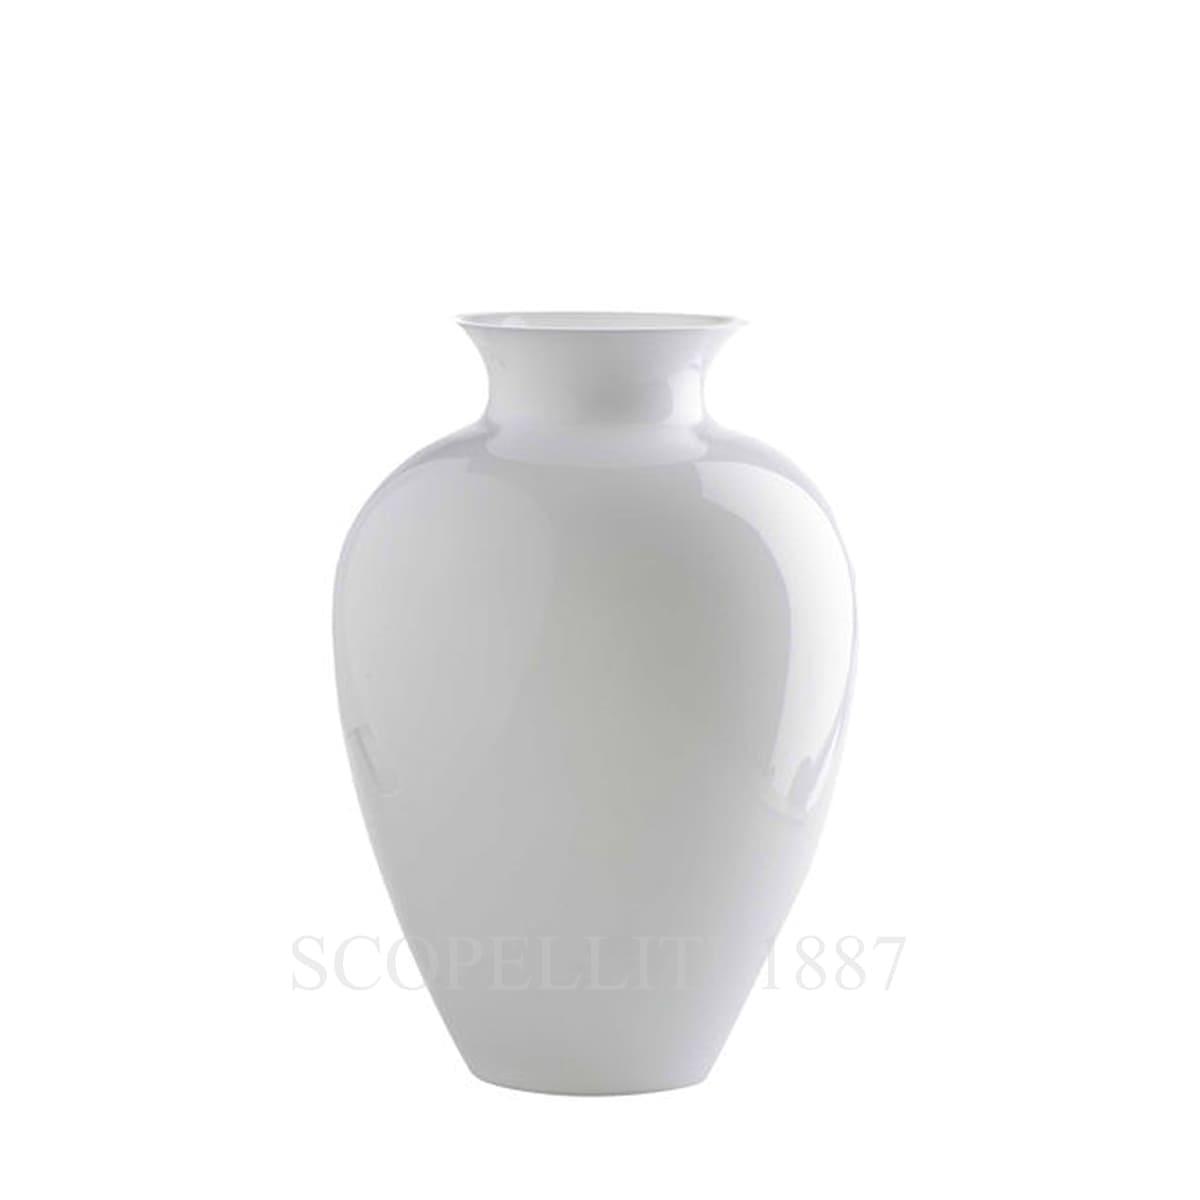 venini labuan italian designer murano glass vase milk white